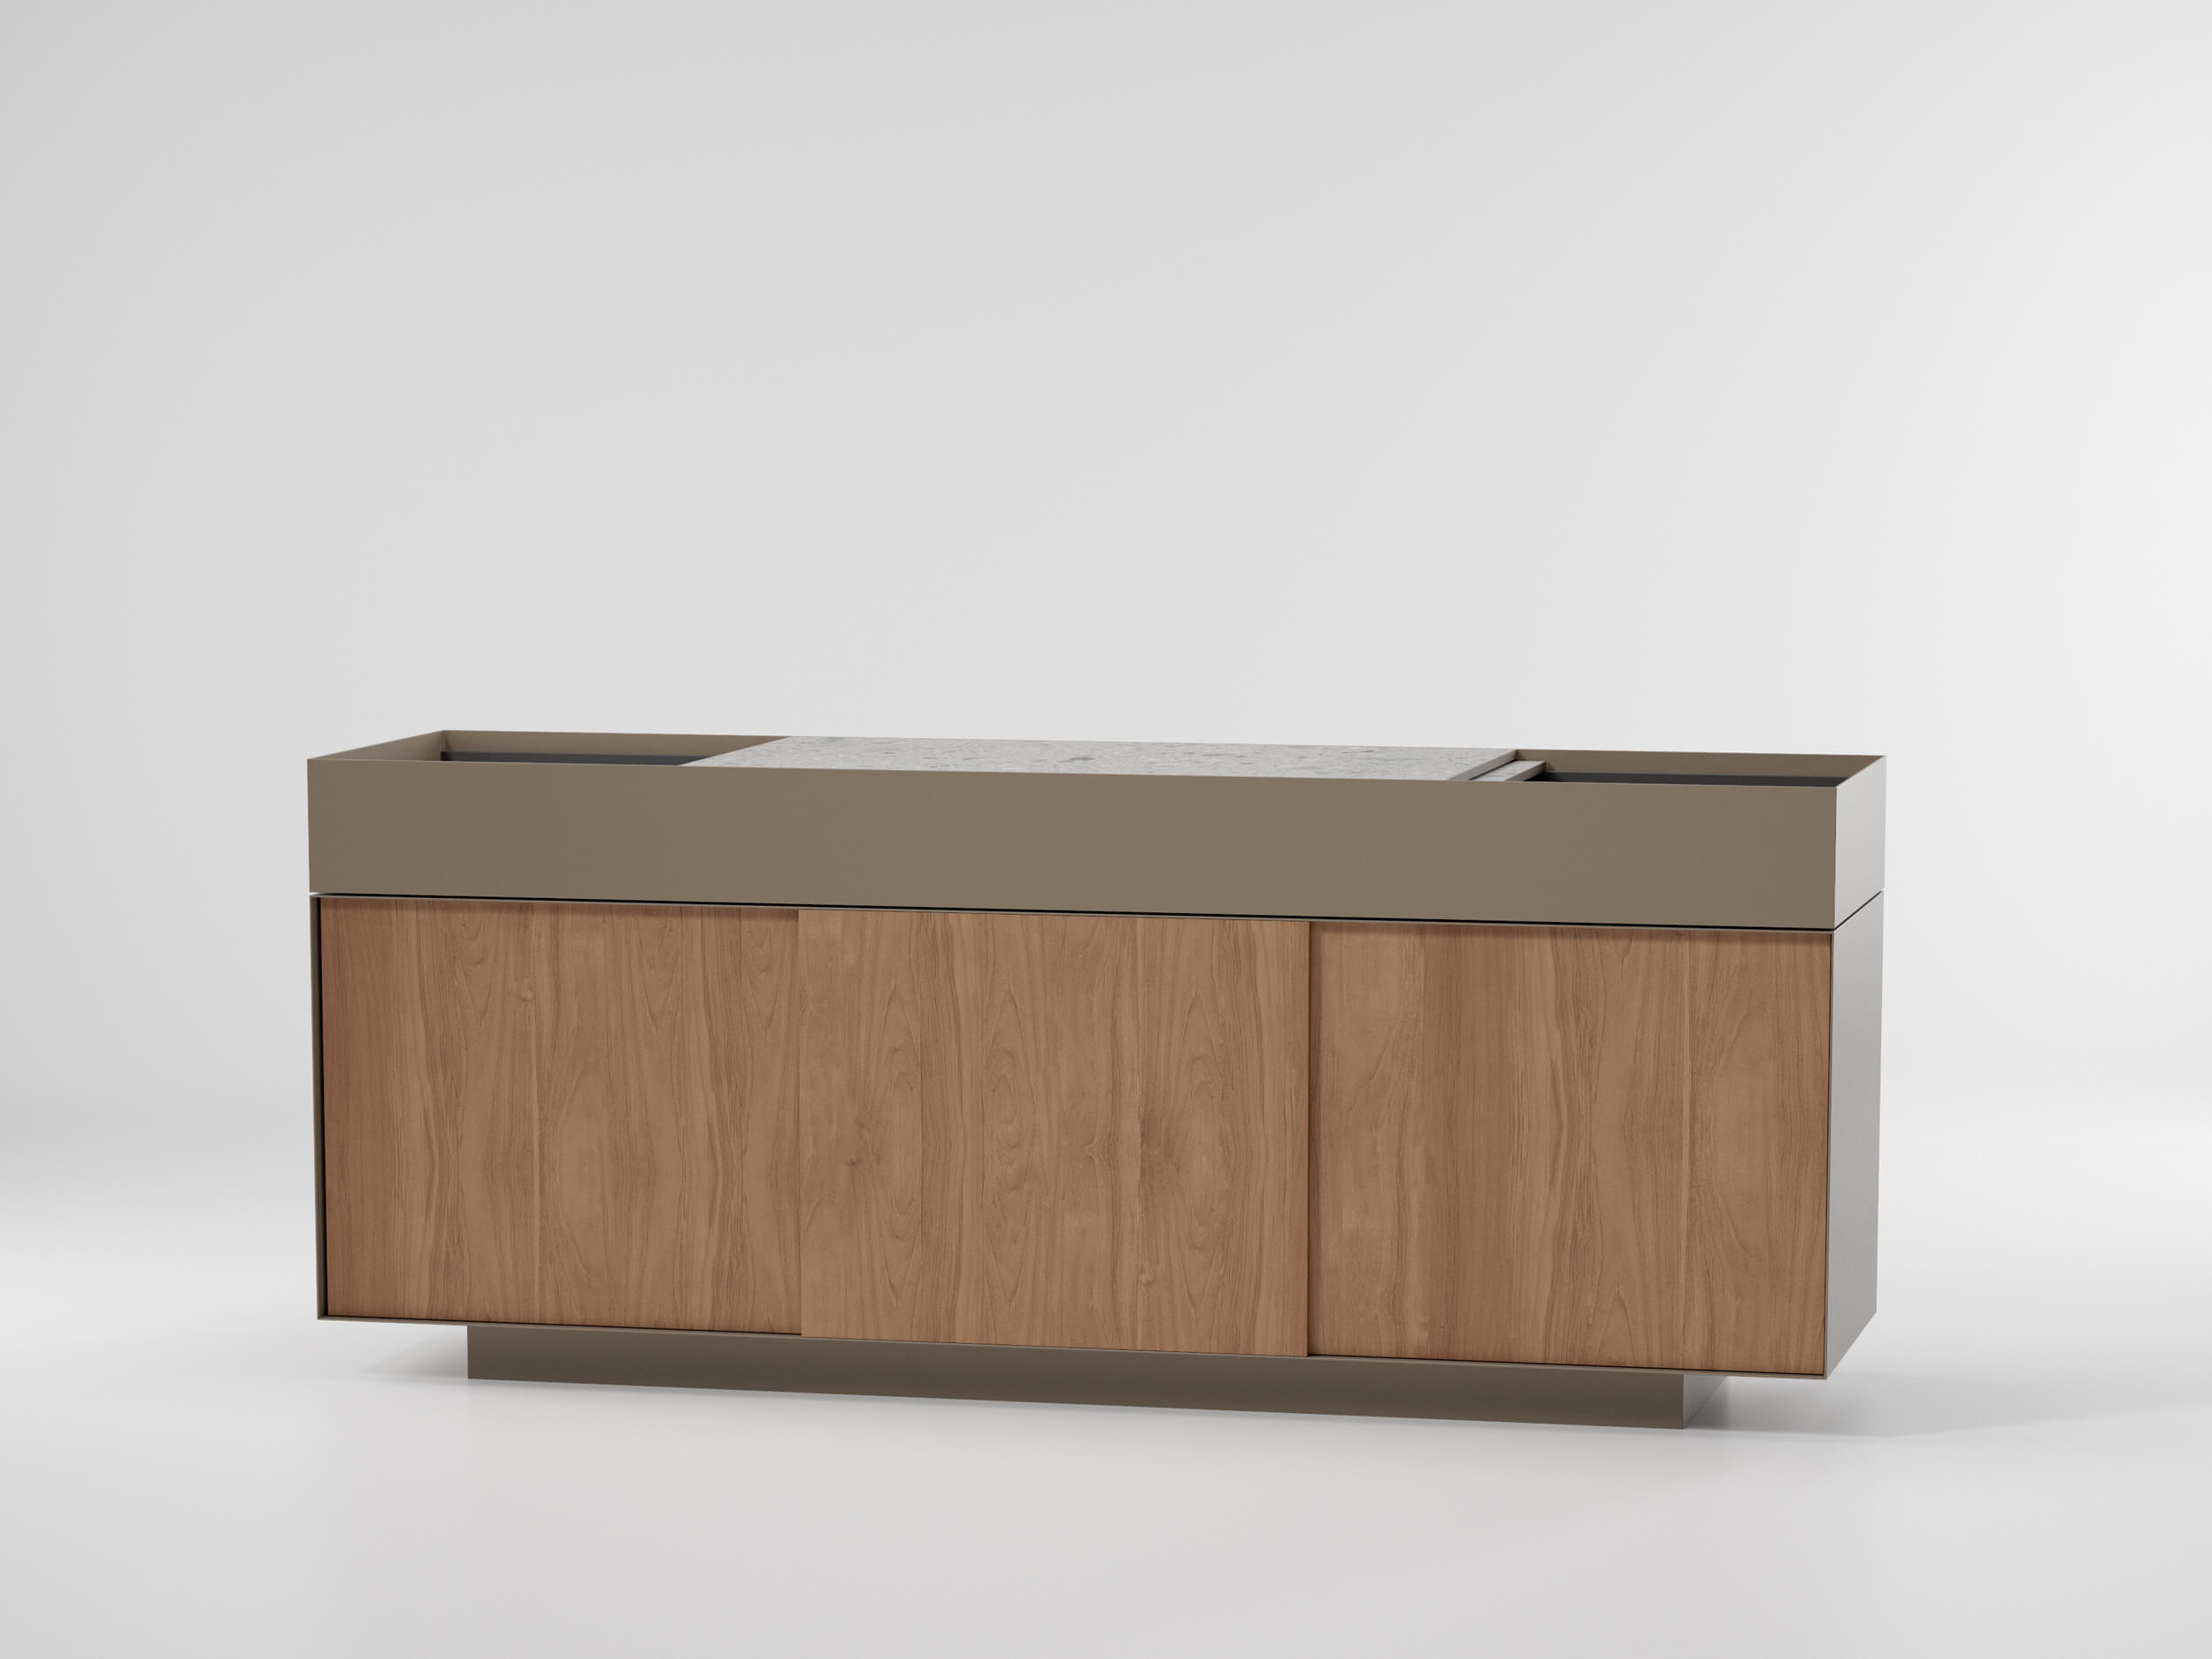 1522_0_kettal_objects_Kitchen_A2.jpg